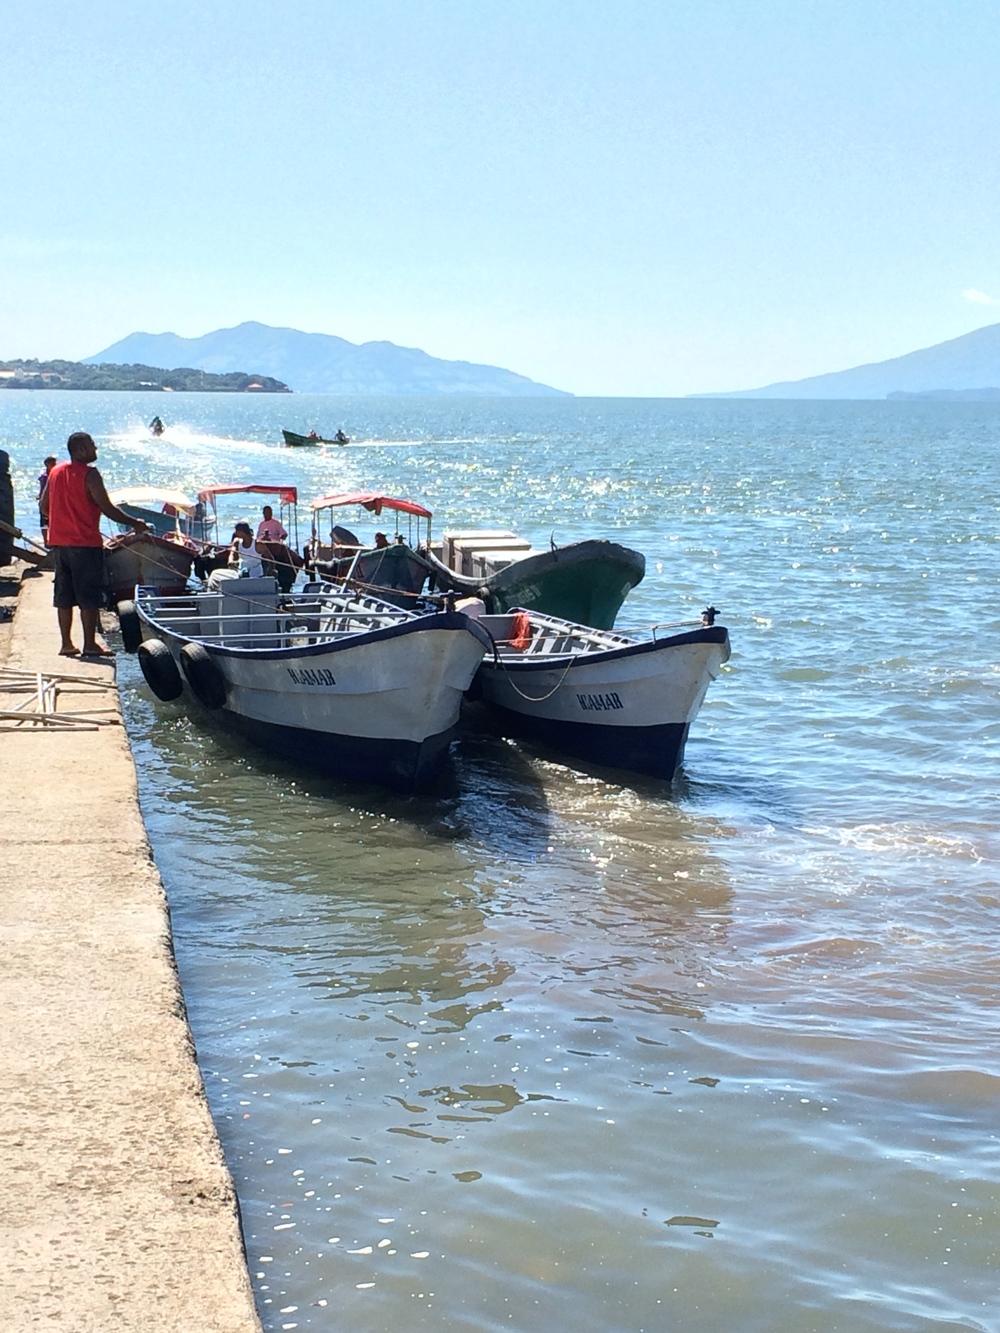 Empty passenger Boats